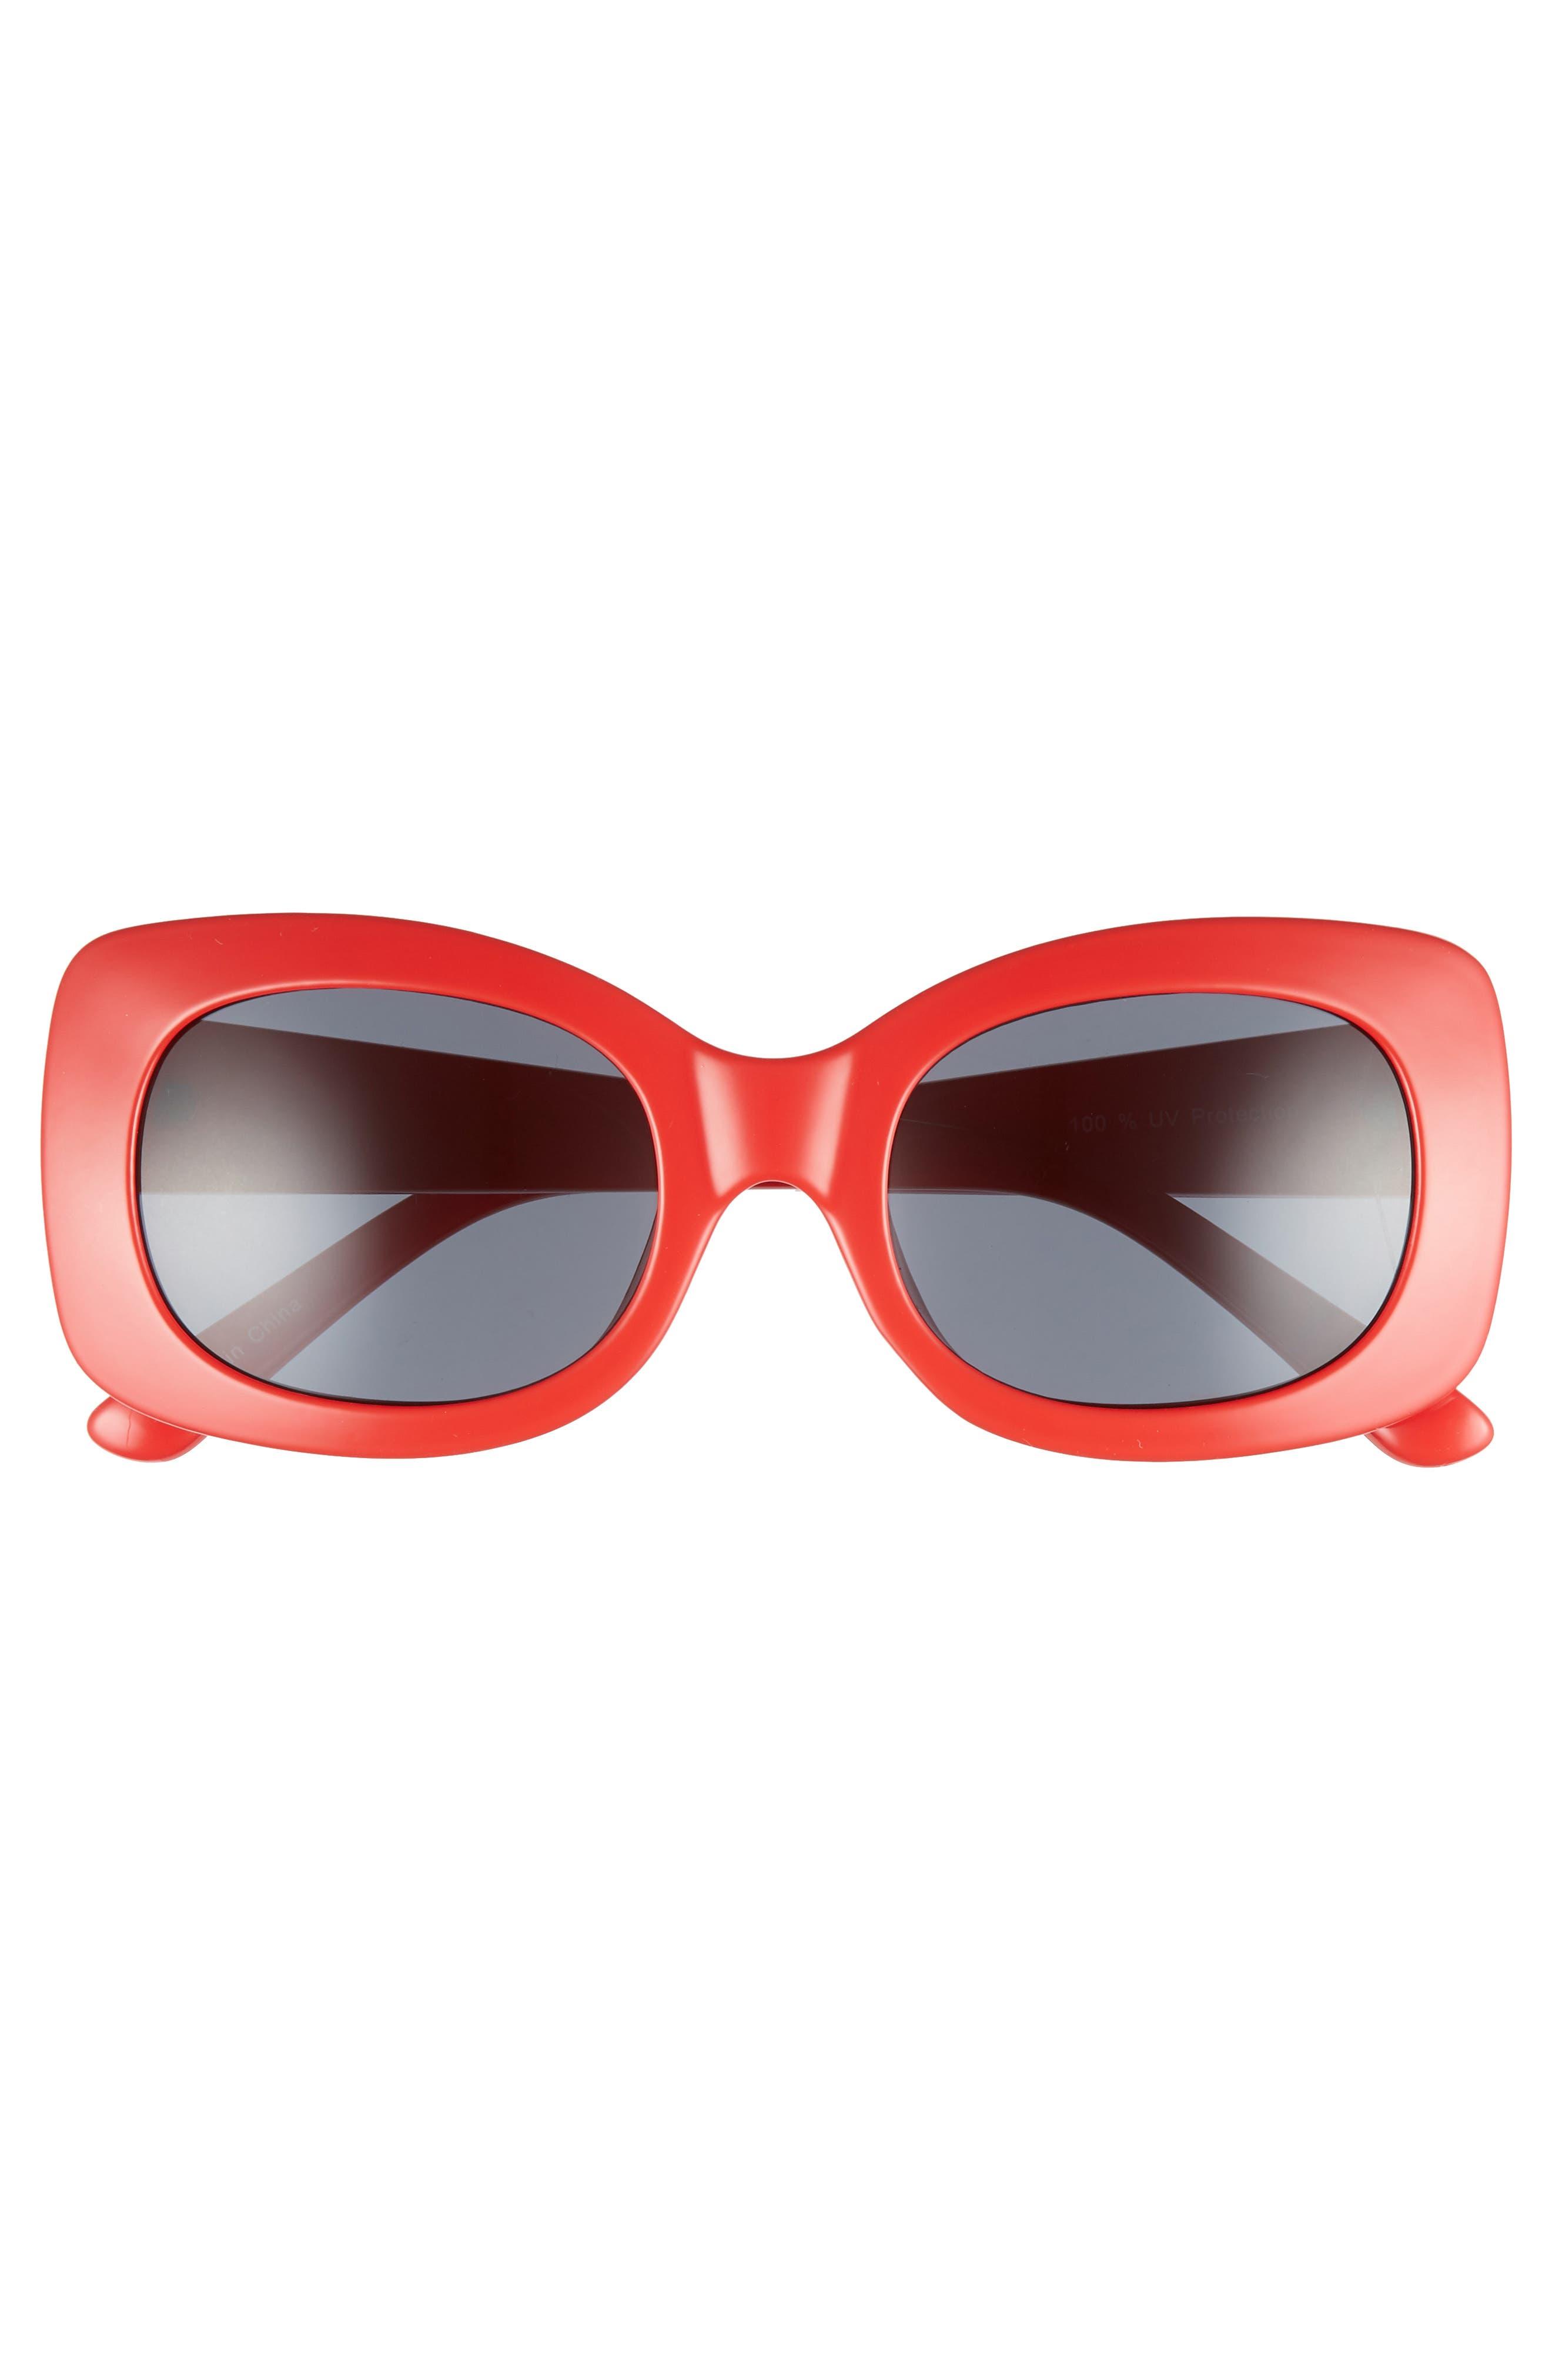 51mm Square Sunglasses,                             Alternate thumbnail 3, color,                             Red/ Black